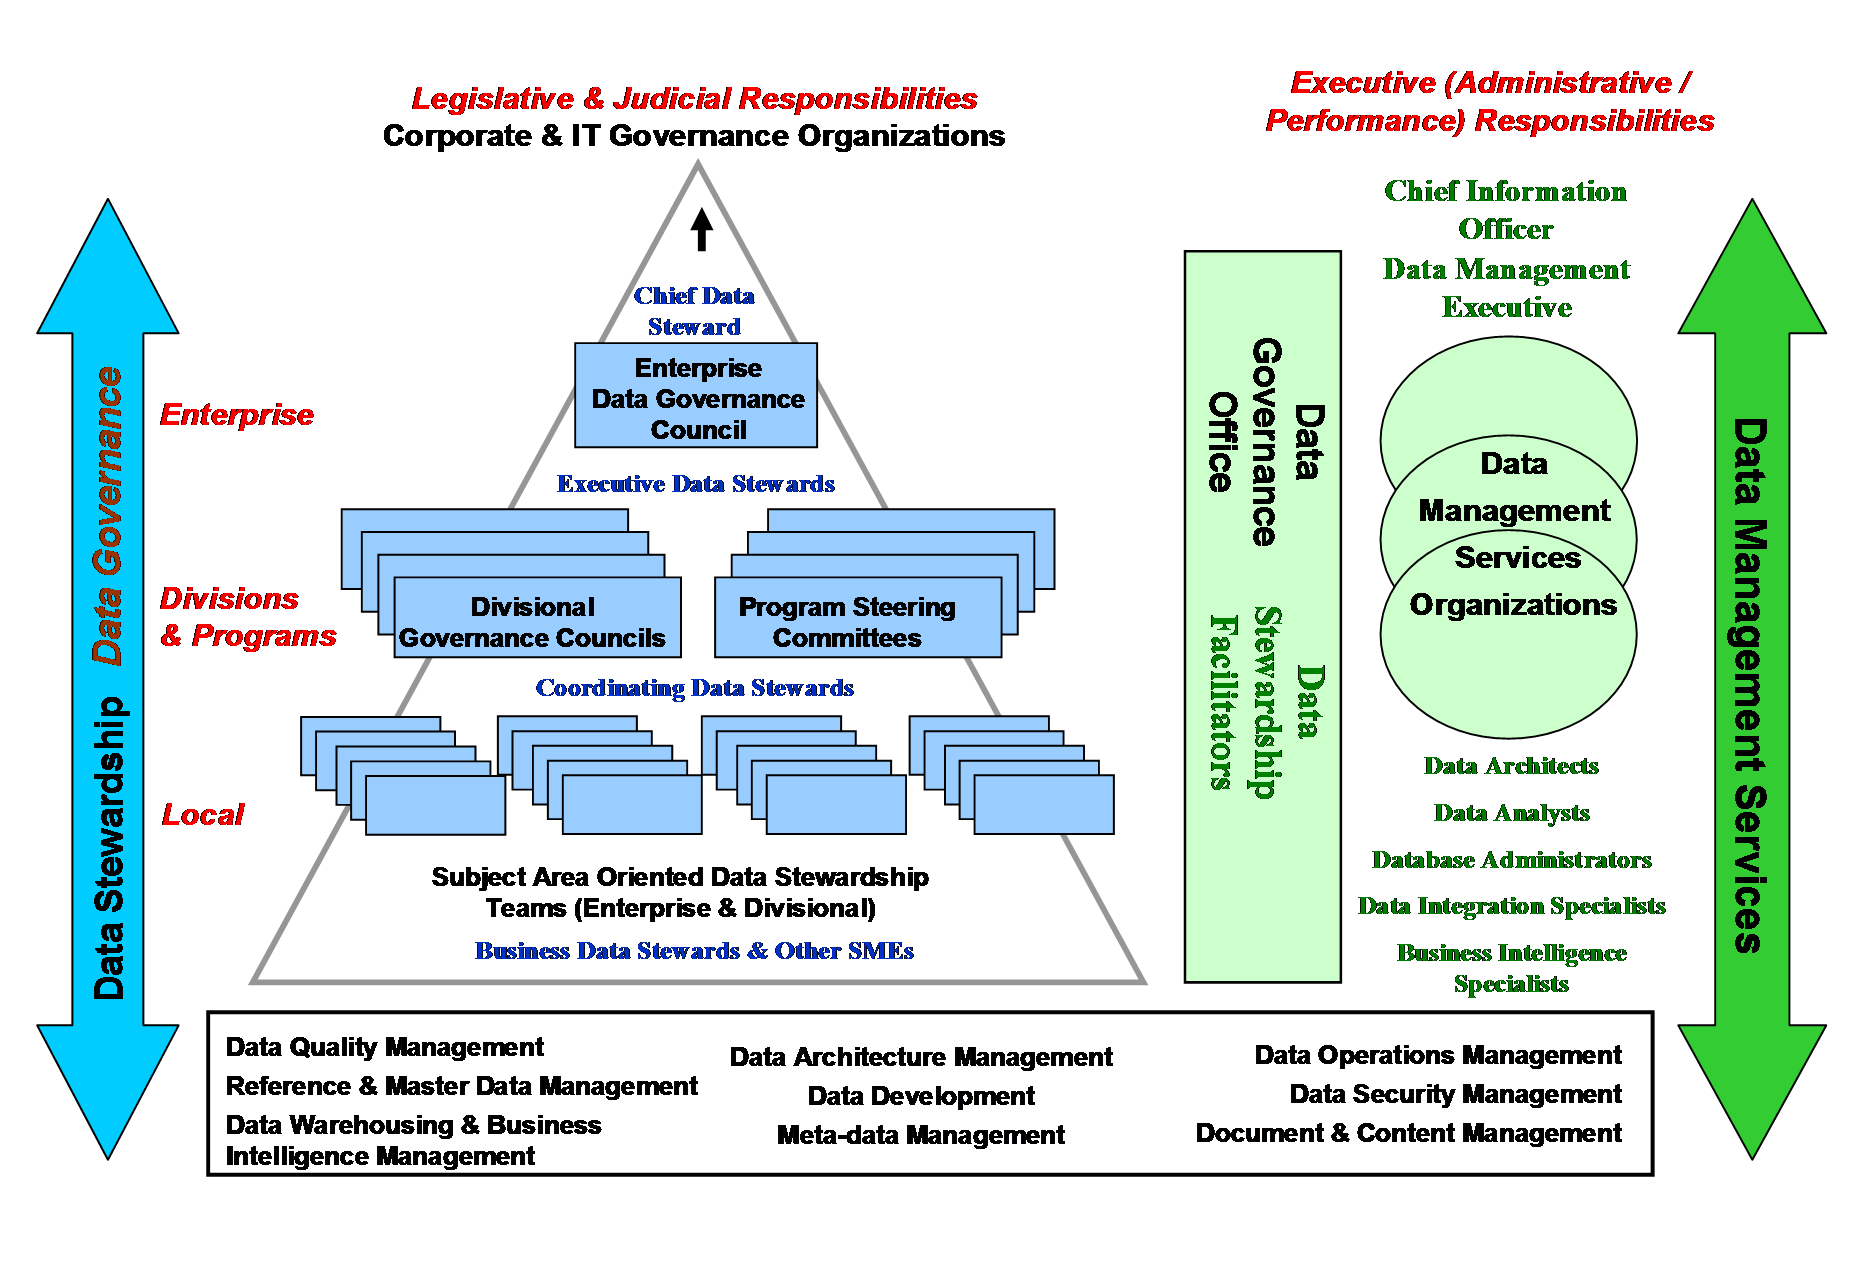 image.014.png (1875×1275) | Data Governance | Pinterest